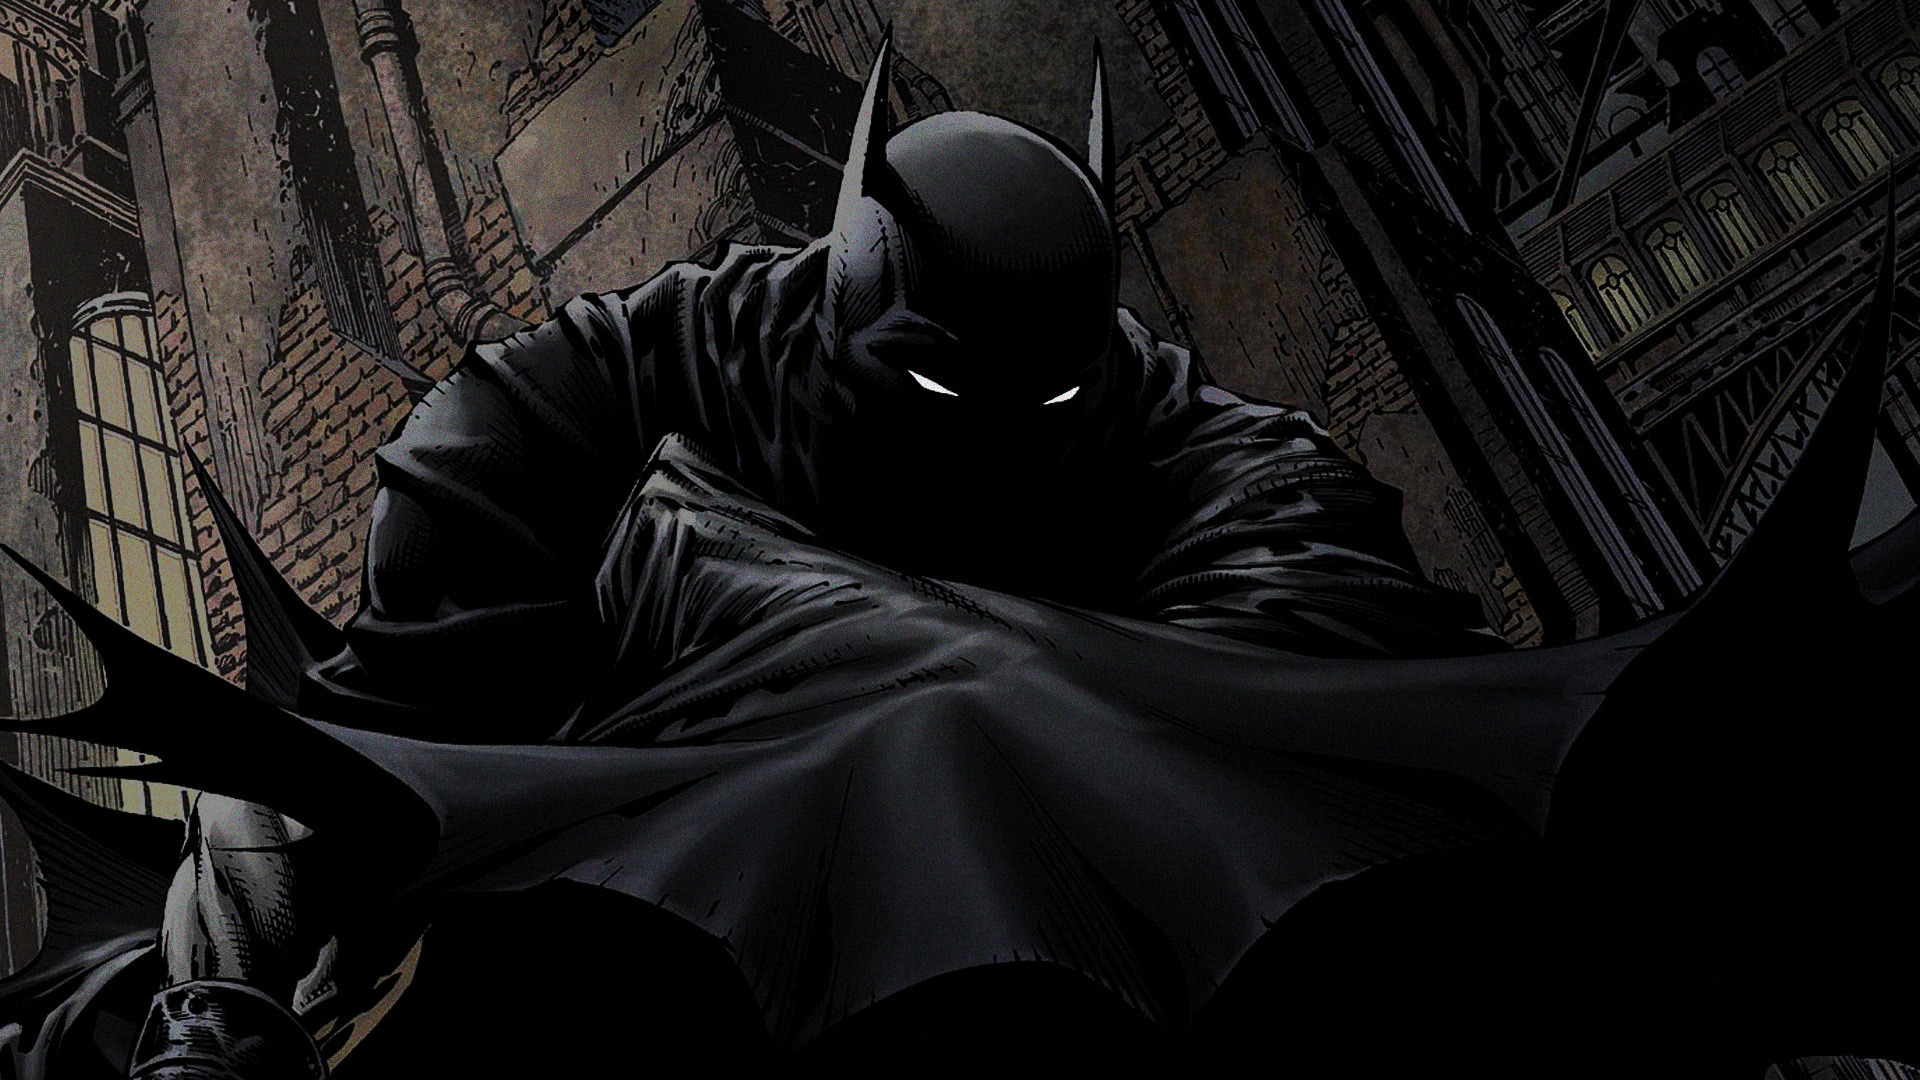 Batman full hd sfondo and sfondi 1920x1080 id 261568 for Sfondi batman